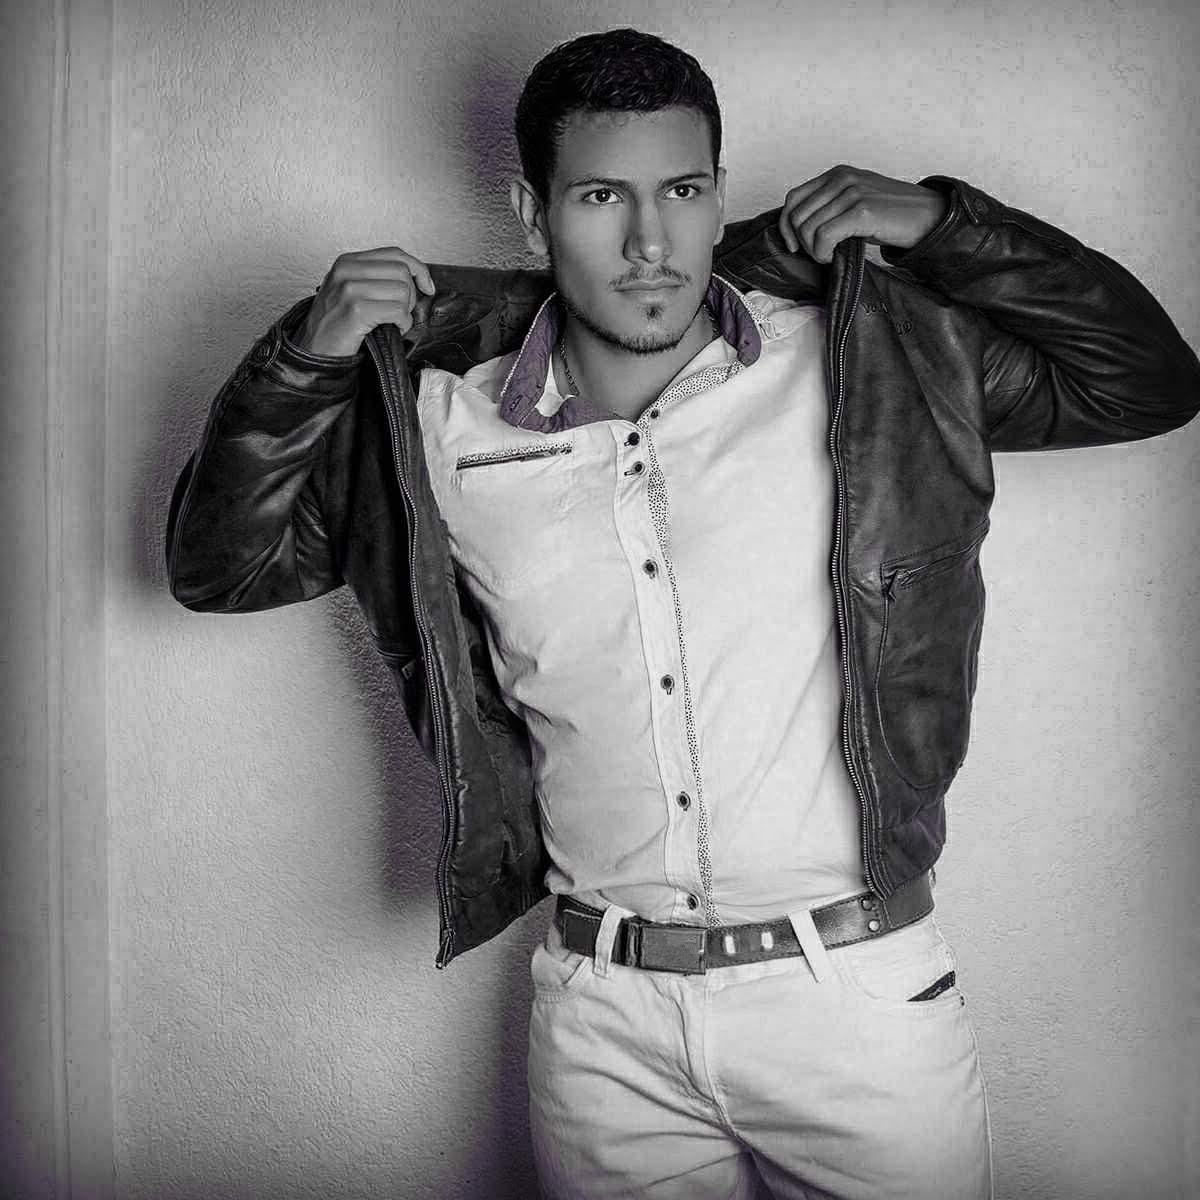 Modo Tbt . Tres años atras. #blackAndWhite #tbt #jacket #LatinMan #camguy #sexyman #Strong #Muscle #Hot #model  @StripchatModels @Stripchat_fan